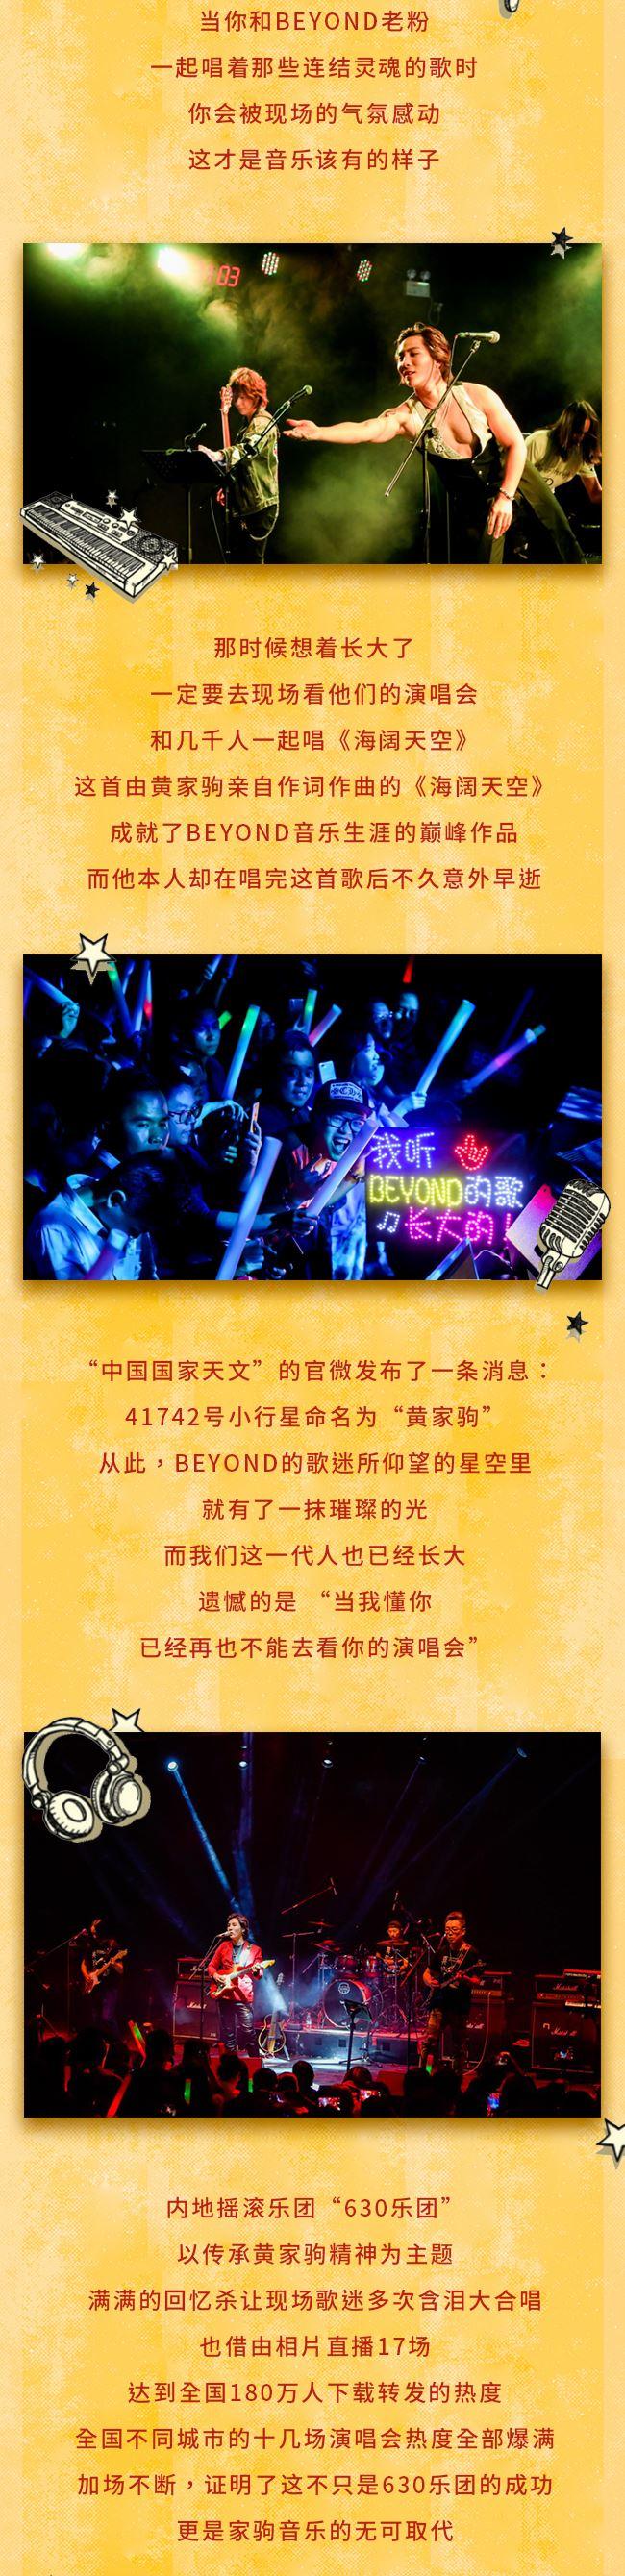 beyond合集长图文_03.jpg